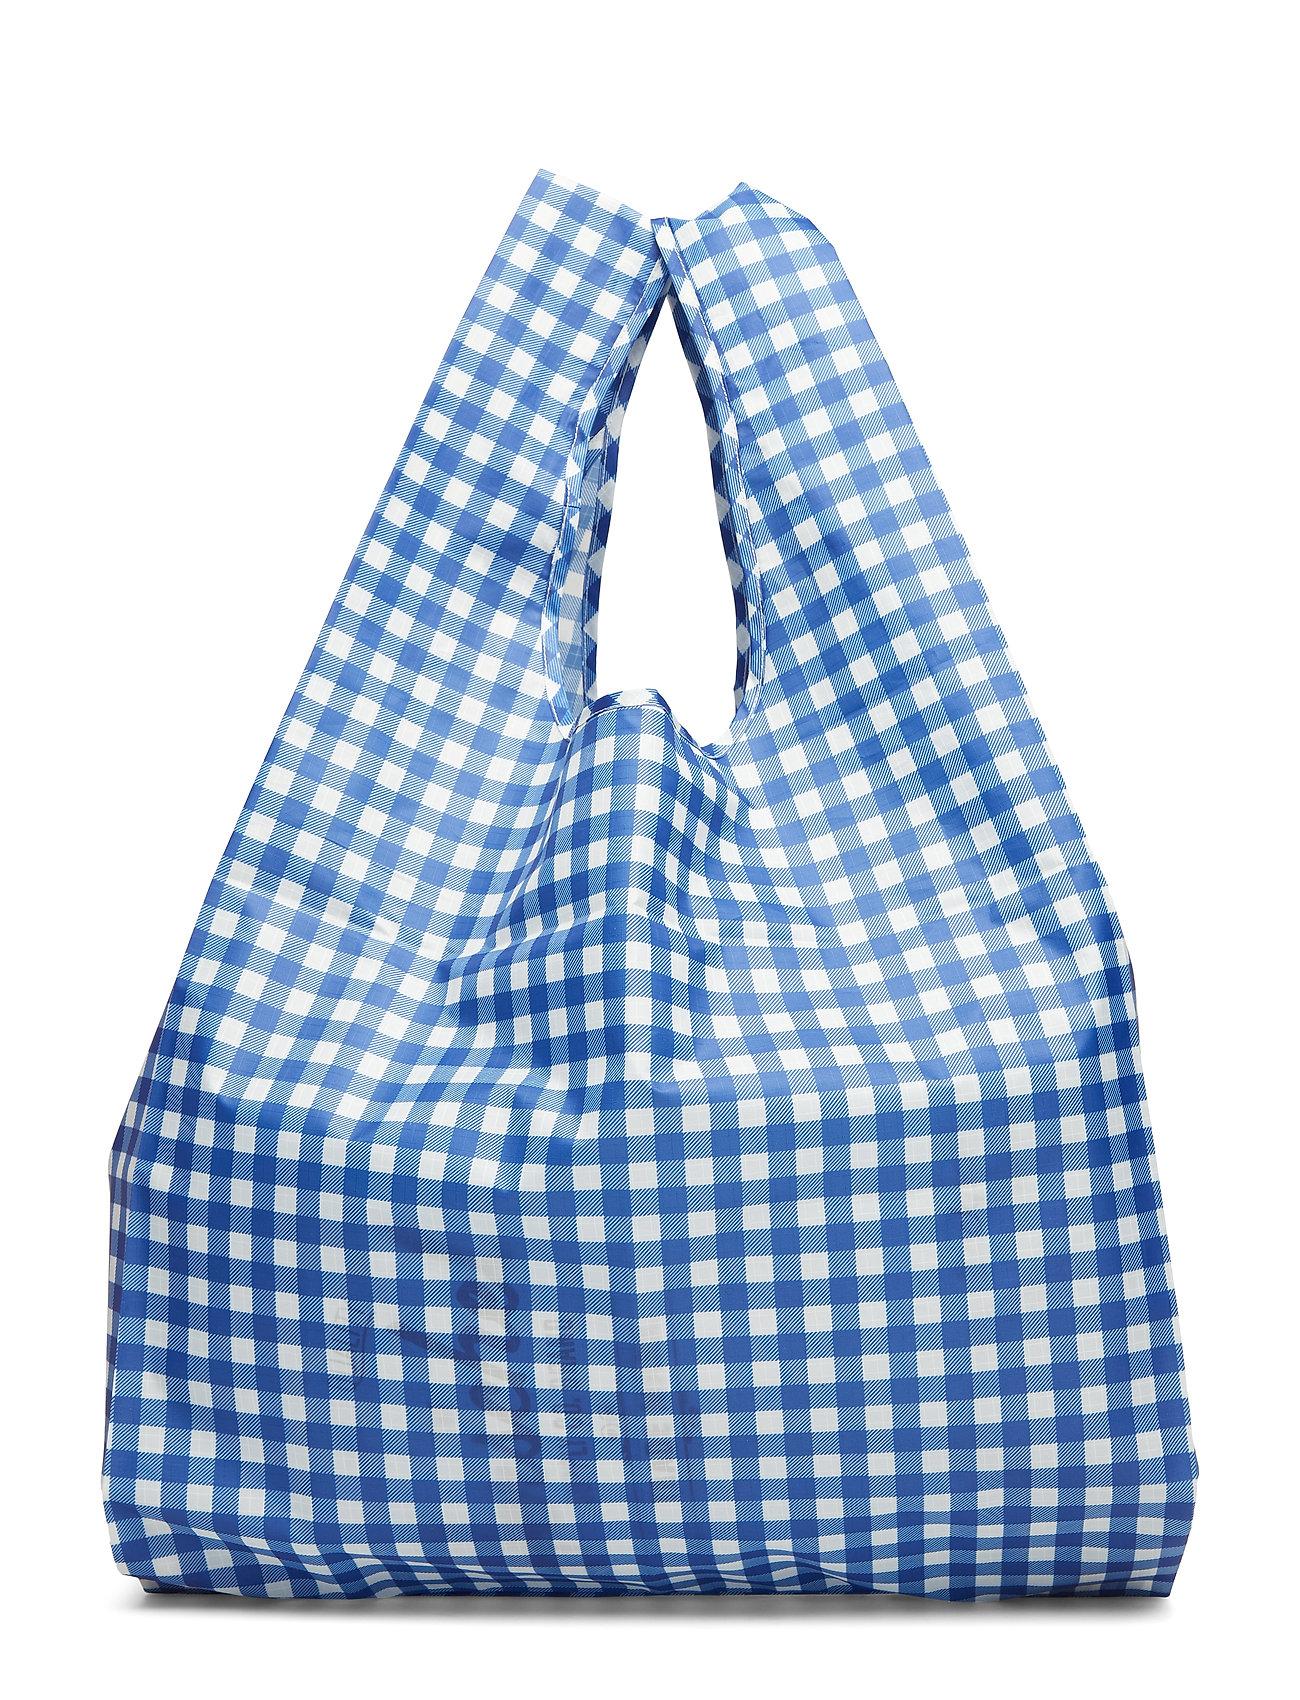 Bag Aop CubettoSamsøeamp; Aop Bethy 10837blu Bag Bethy 10837blu doeWrxBC